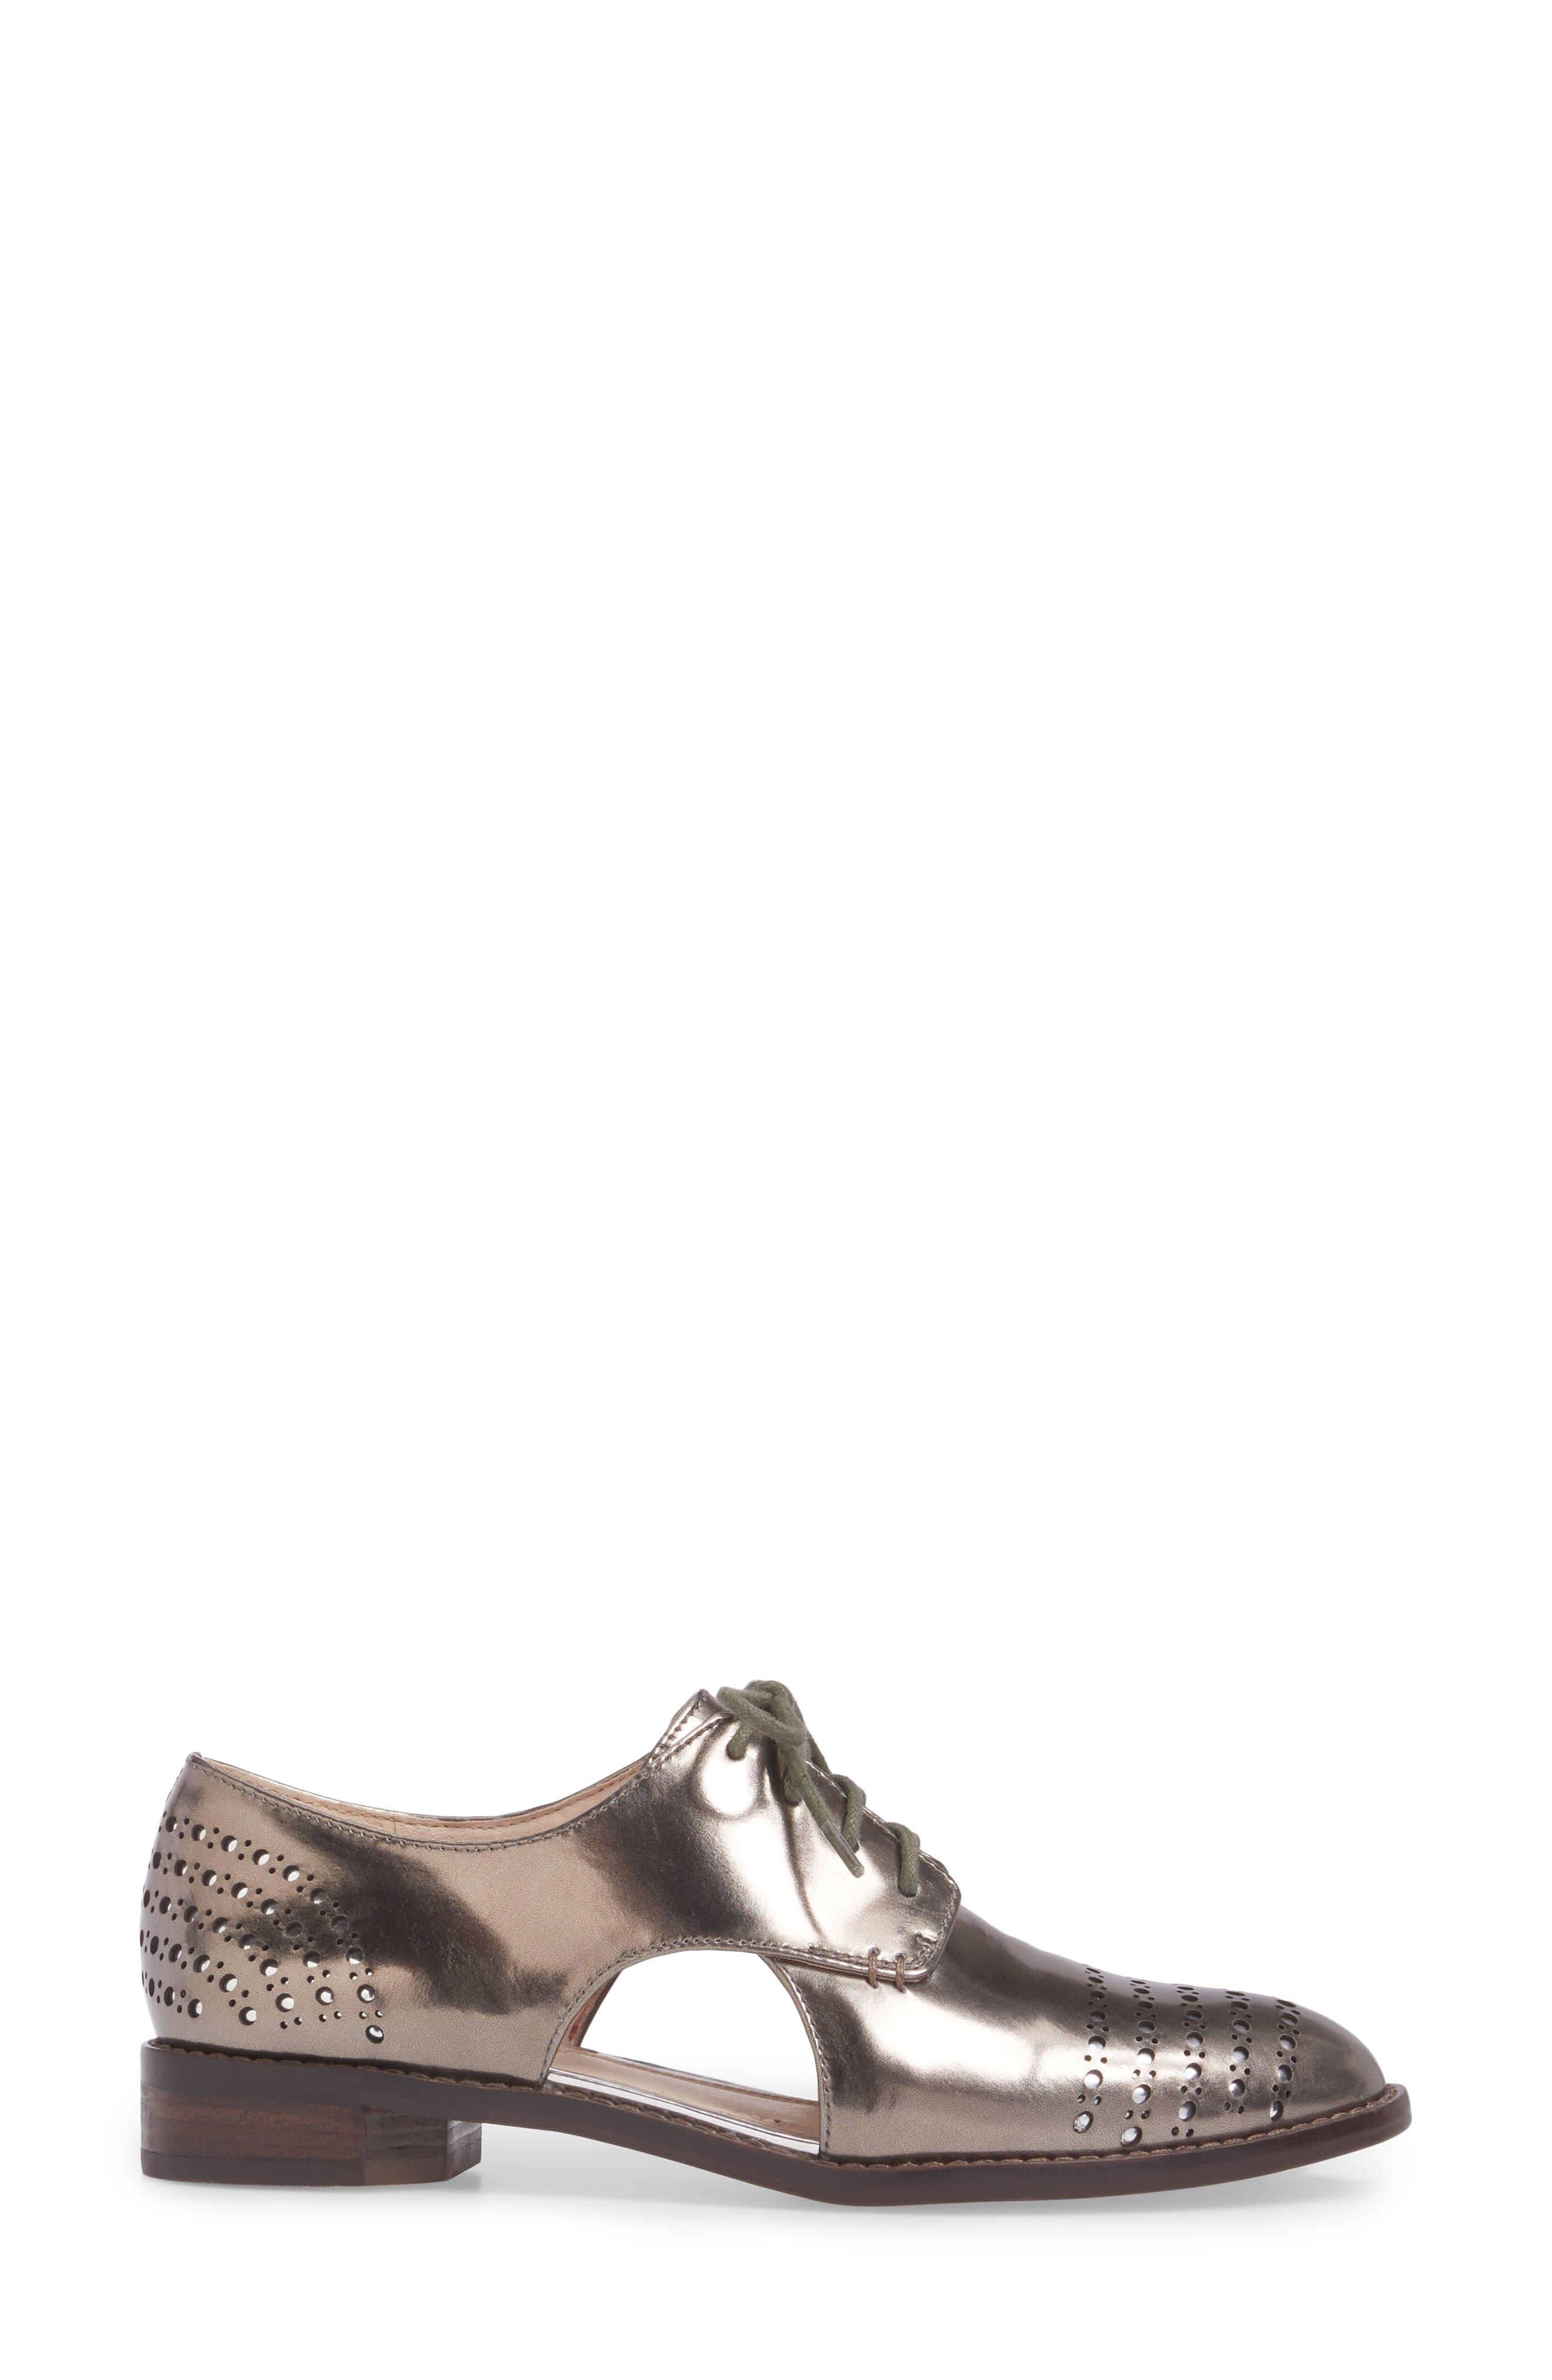 Felta Cutout Oxford,                             Alternate thumbnail 3, color,                             Iron Specchio Leather